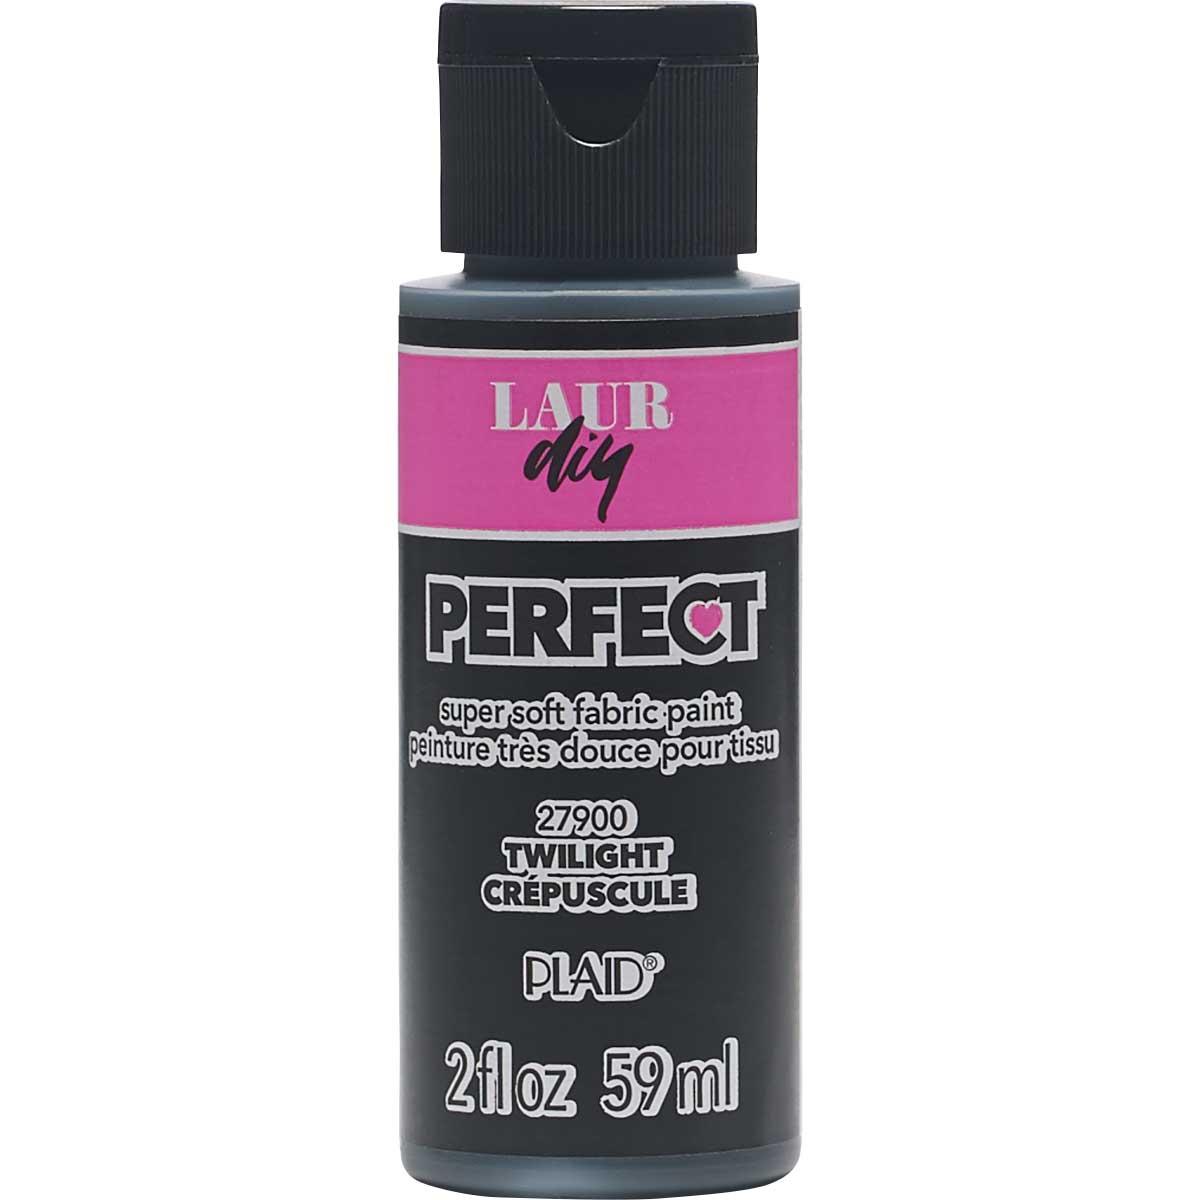 LaurDIY ® Perfect Fabric Paint - Twilight, 2 oz.